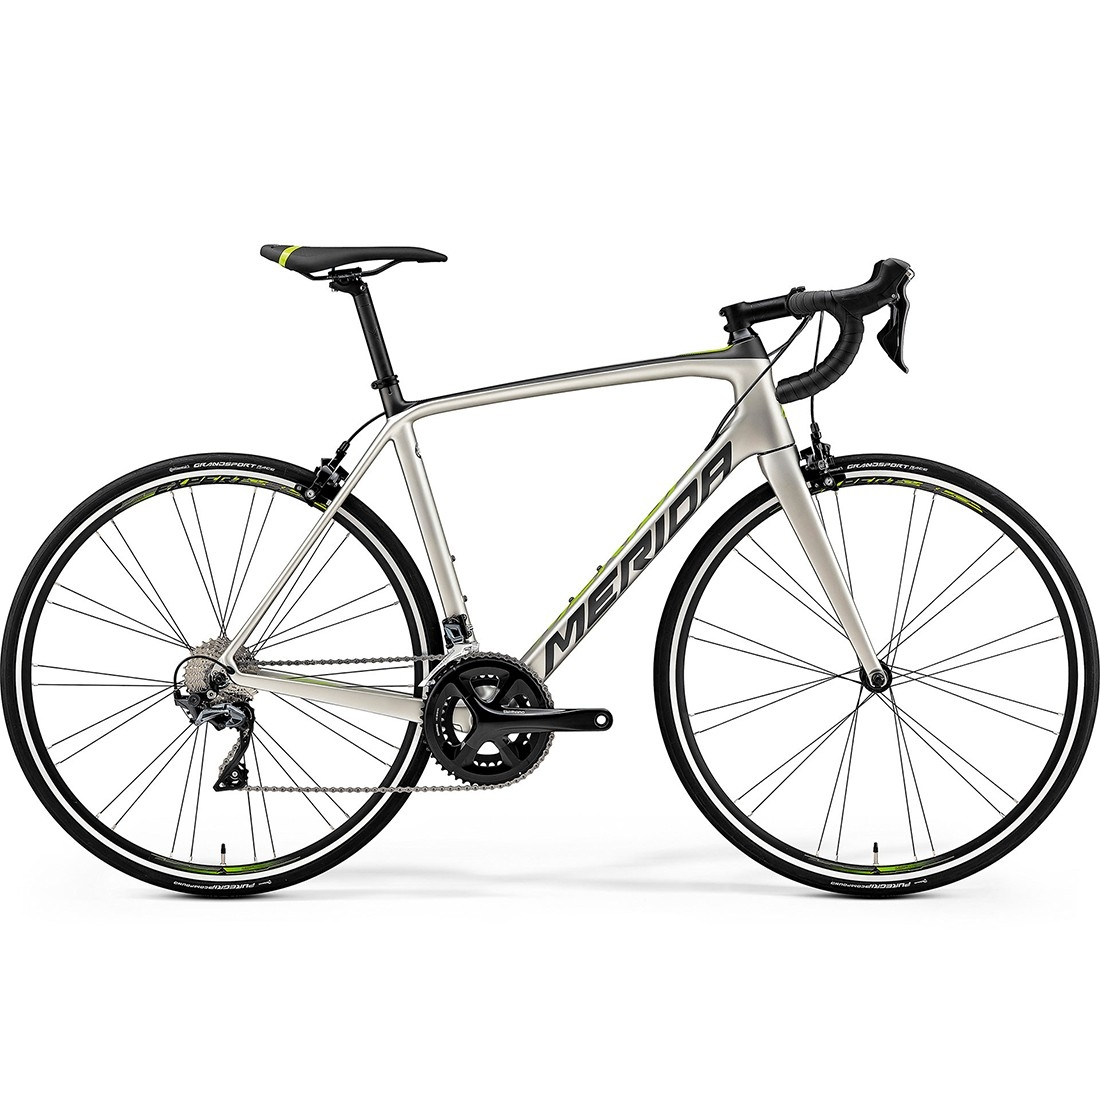 Merida Scultura 5000 2019 Grey Green Road Bike